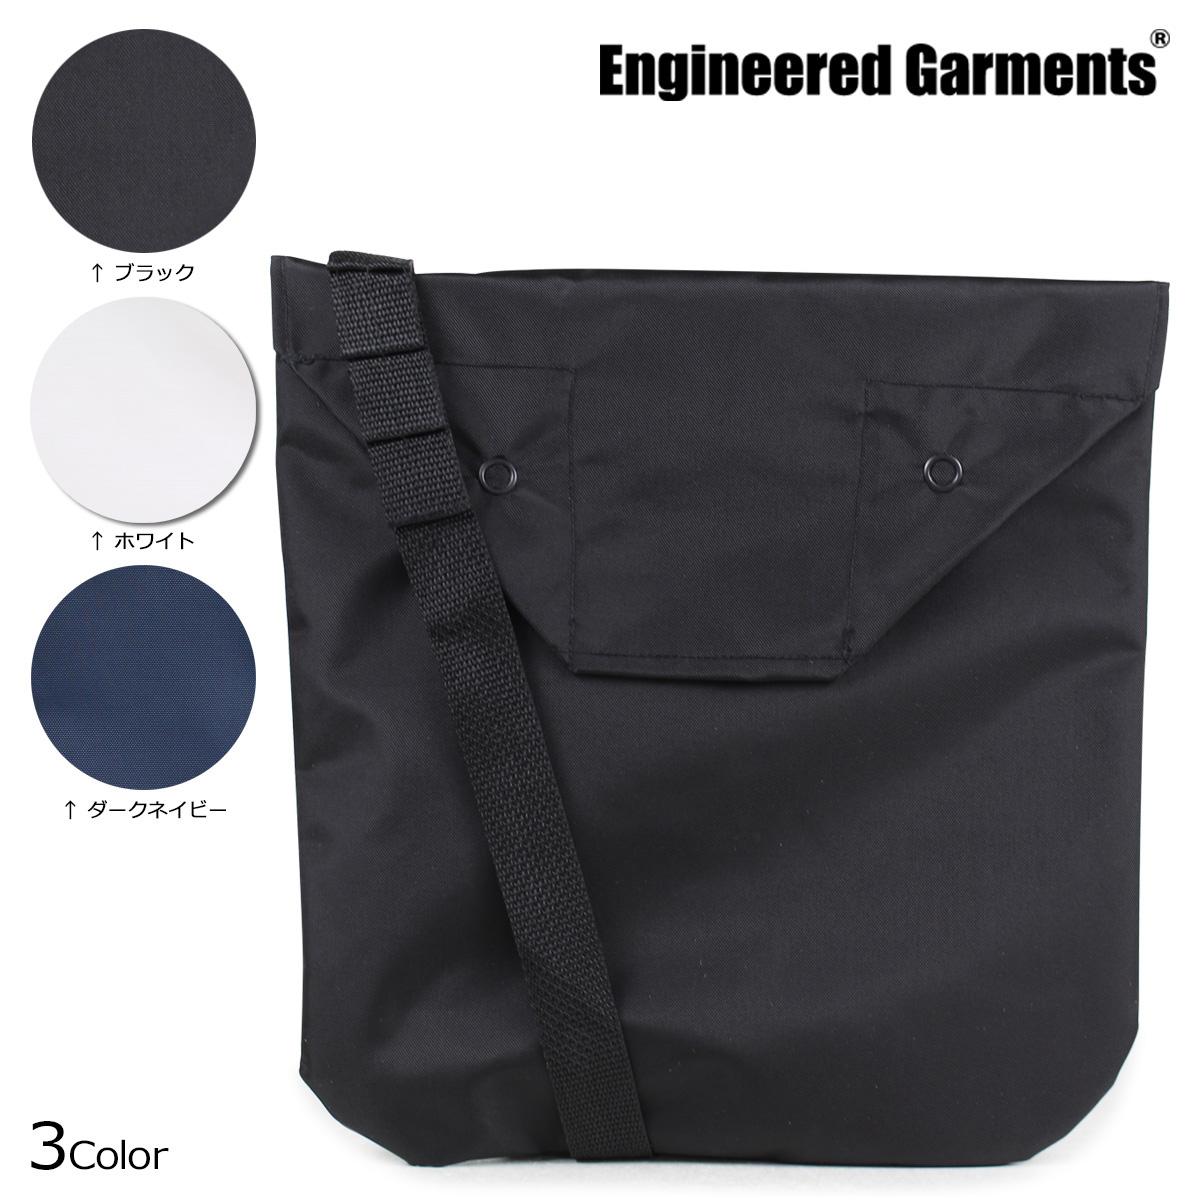 ENGINEERED GARMENTS エンジニアドガーメンツ バッグ メンズ レディース ショルダーバッグ SHOULDER POUCH ブラック ホワイト ネイビー